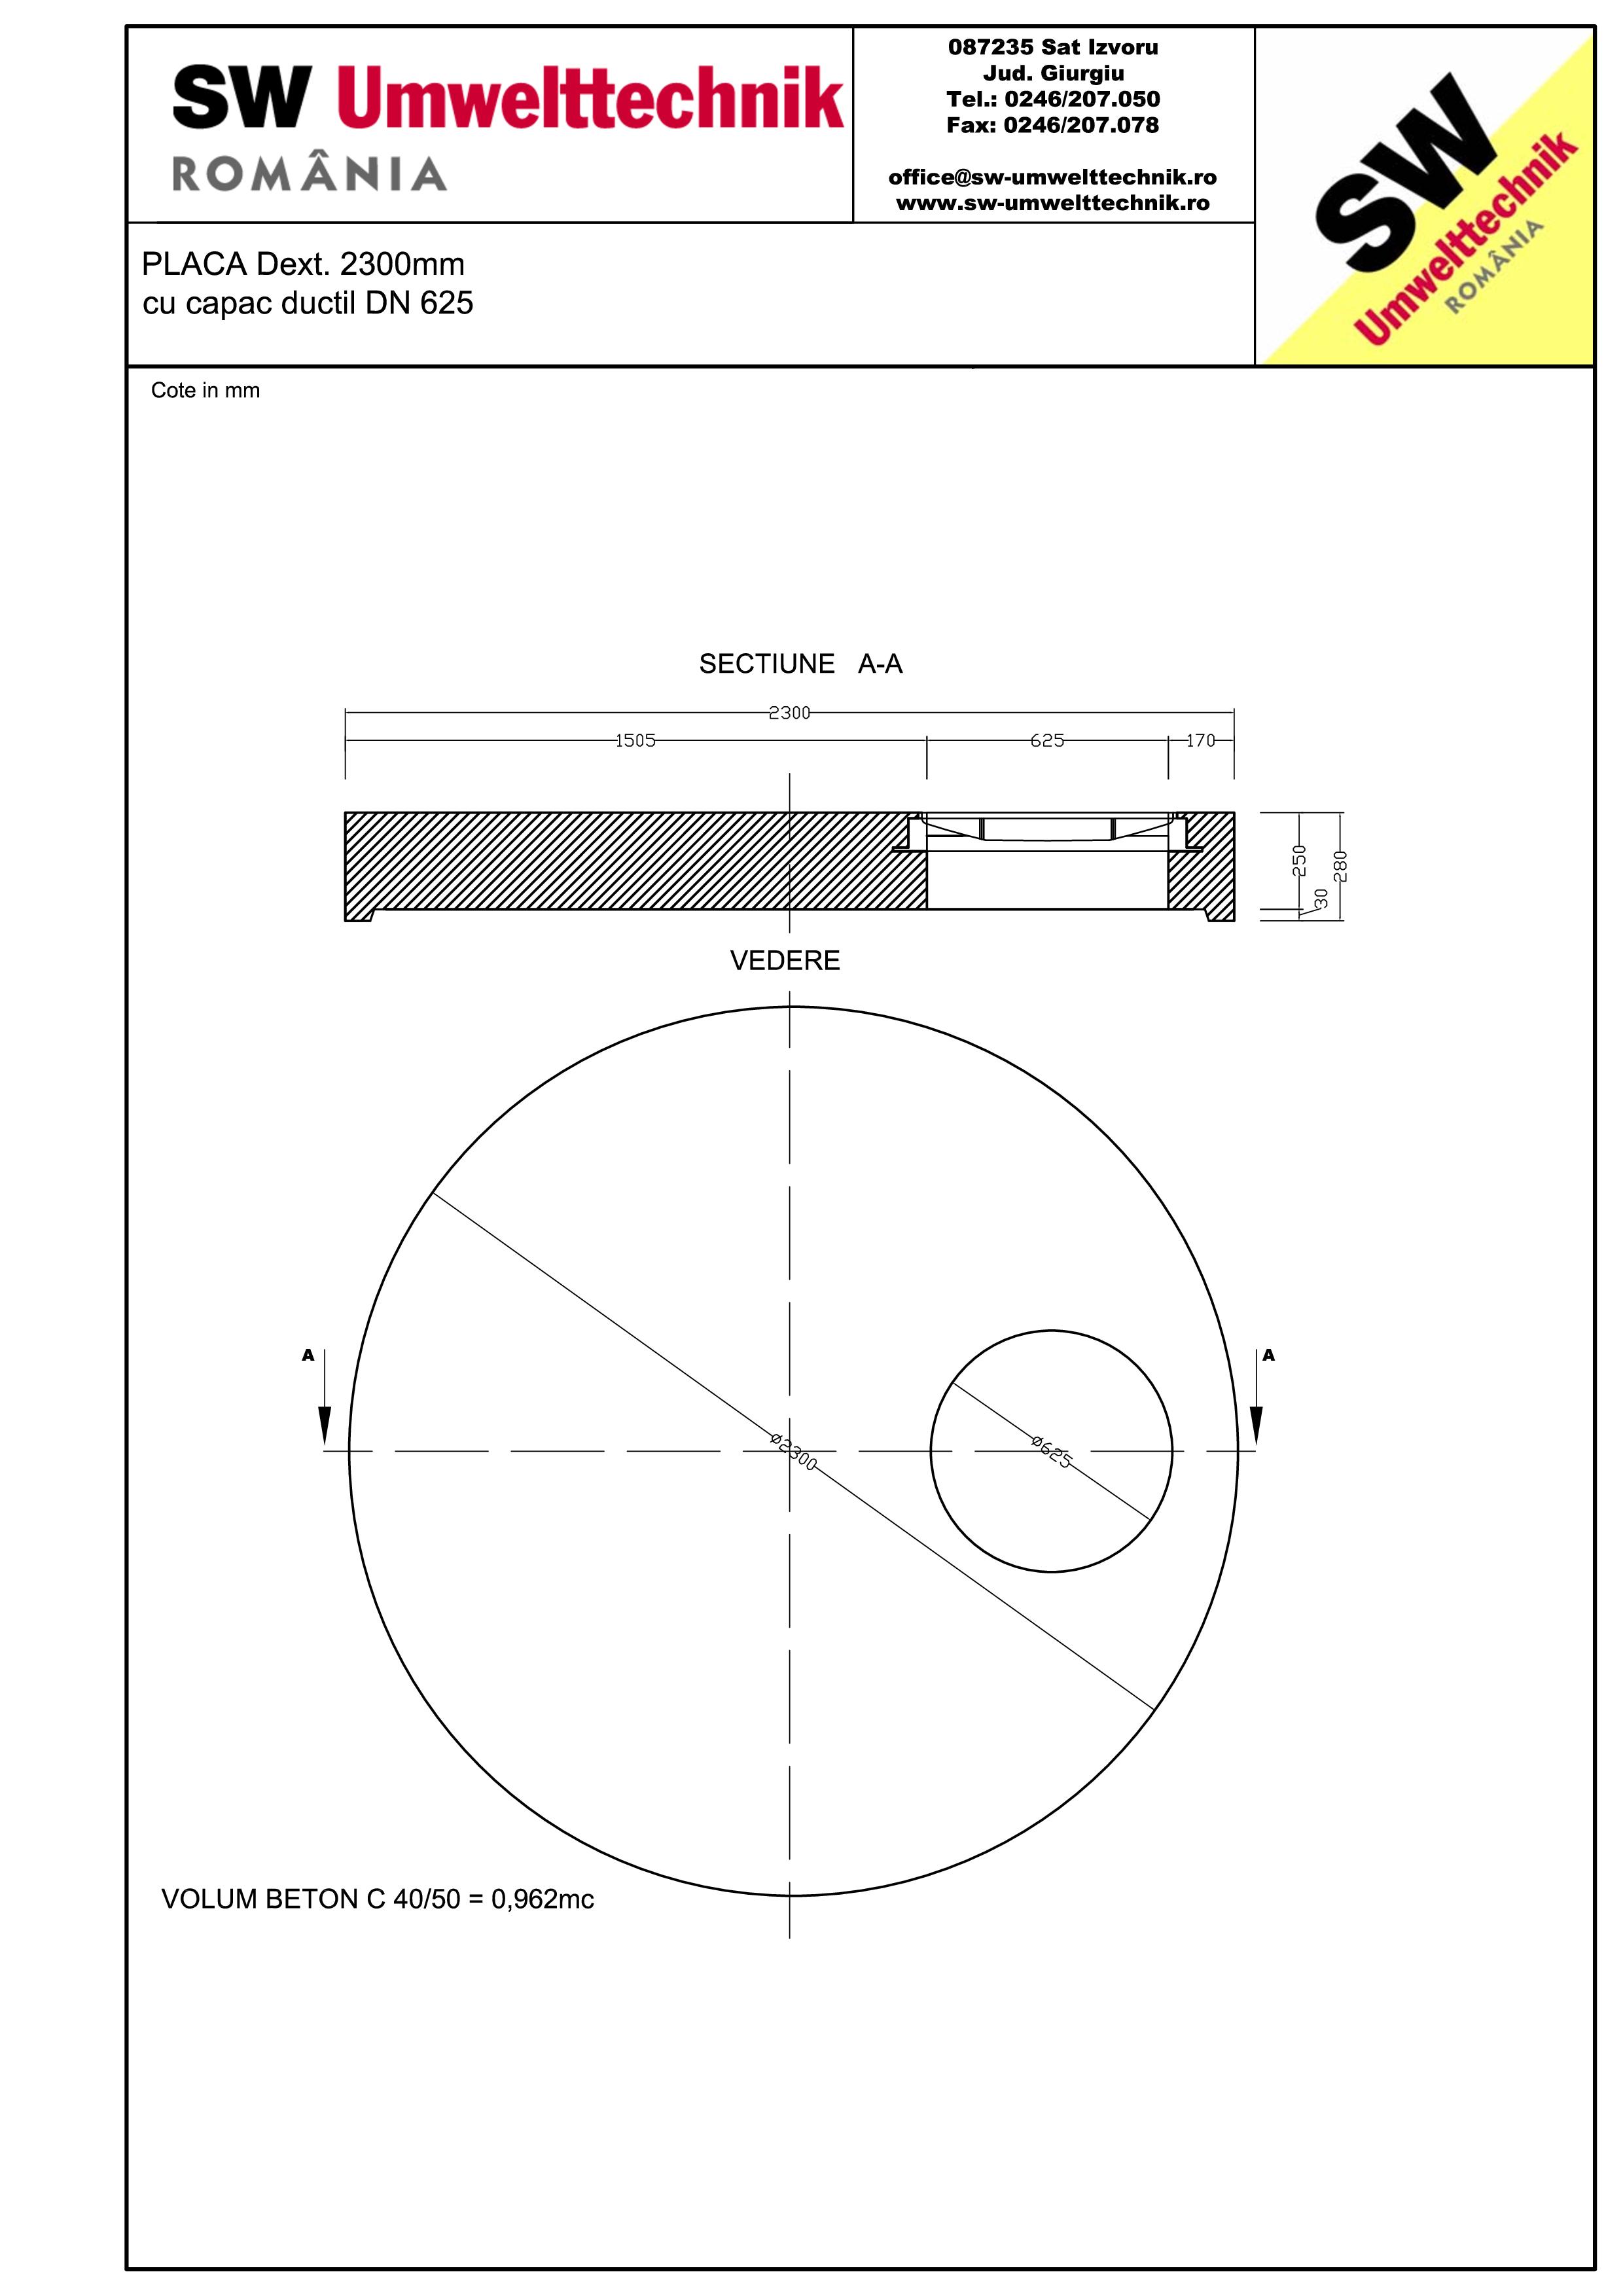 Pagina 1 - CAD-PDF Placa Dext.2300 H250 cu capac ductil DN625 SW UMWELTTECHNIK Detaliu de produs